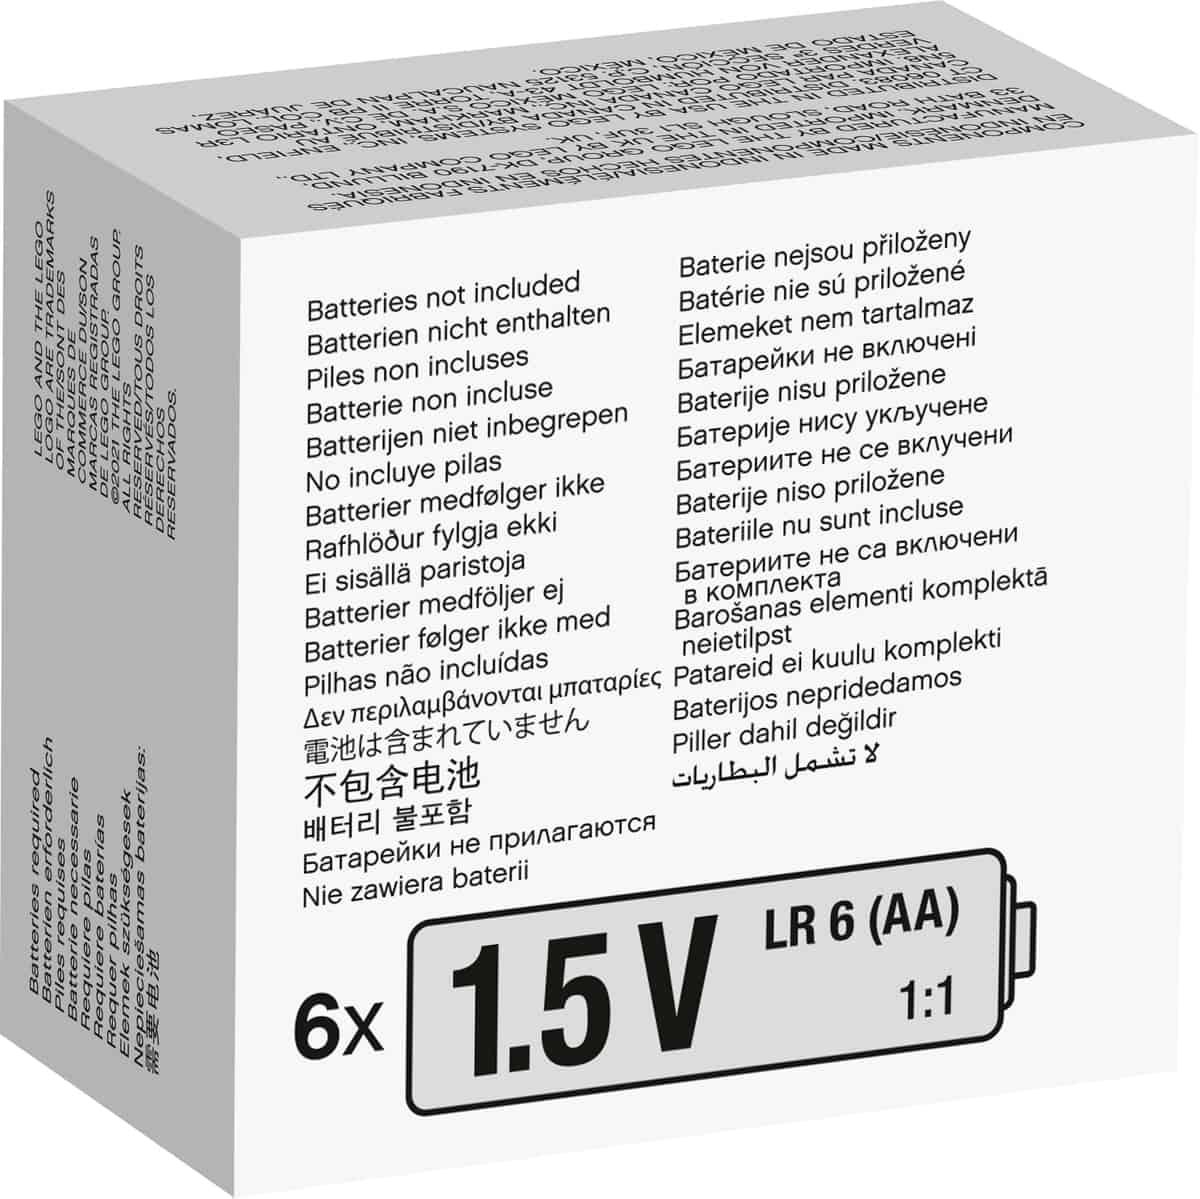 lego 88015 battery